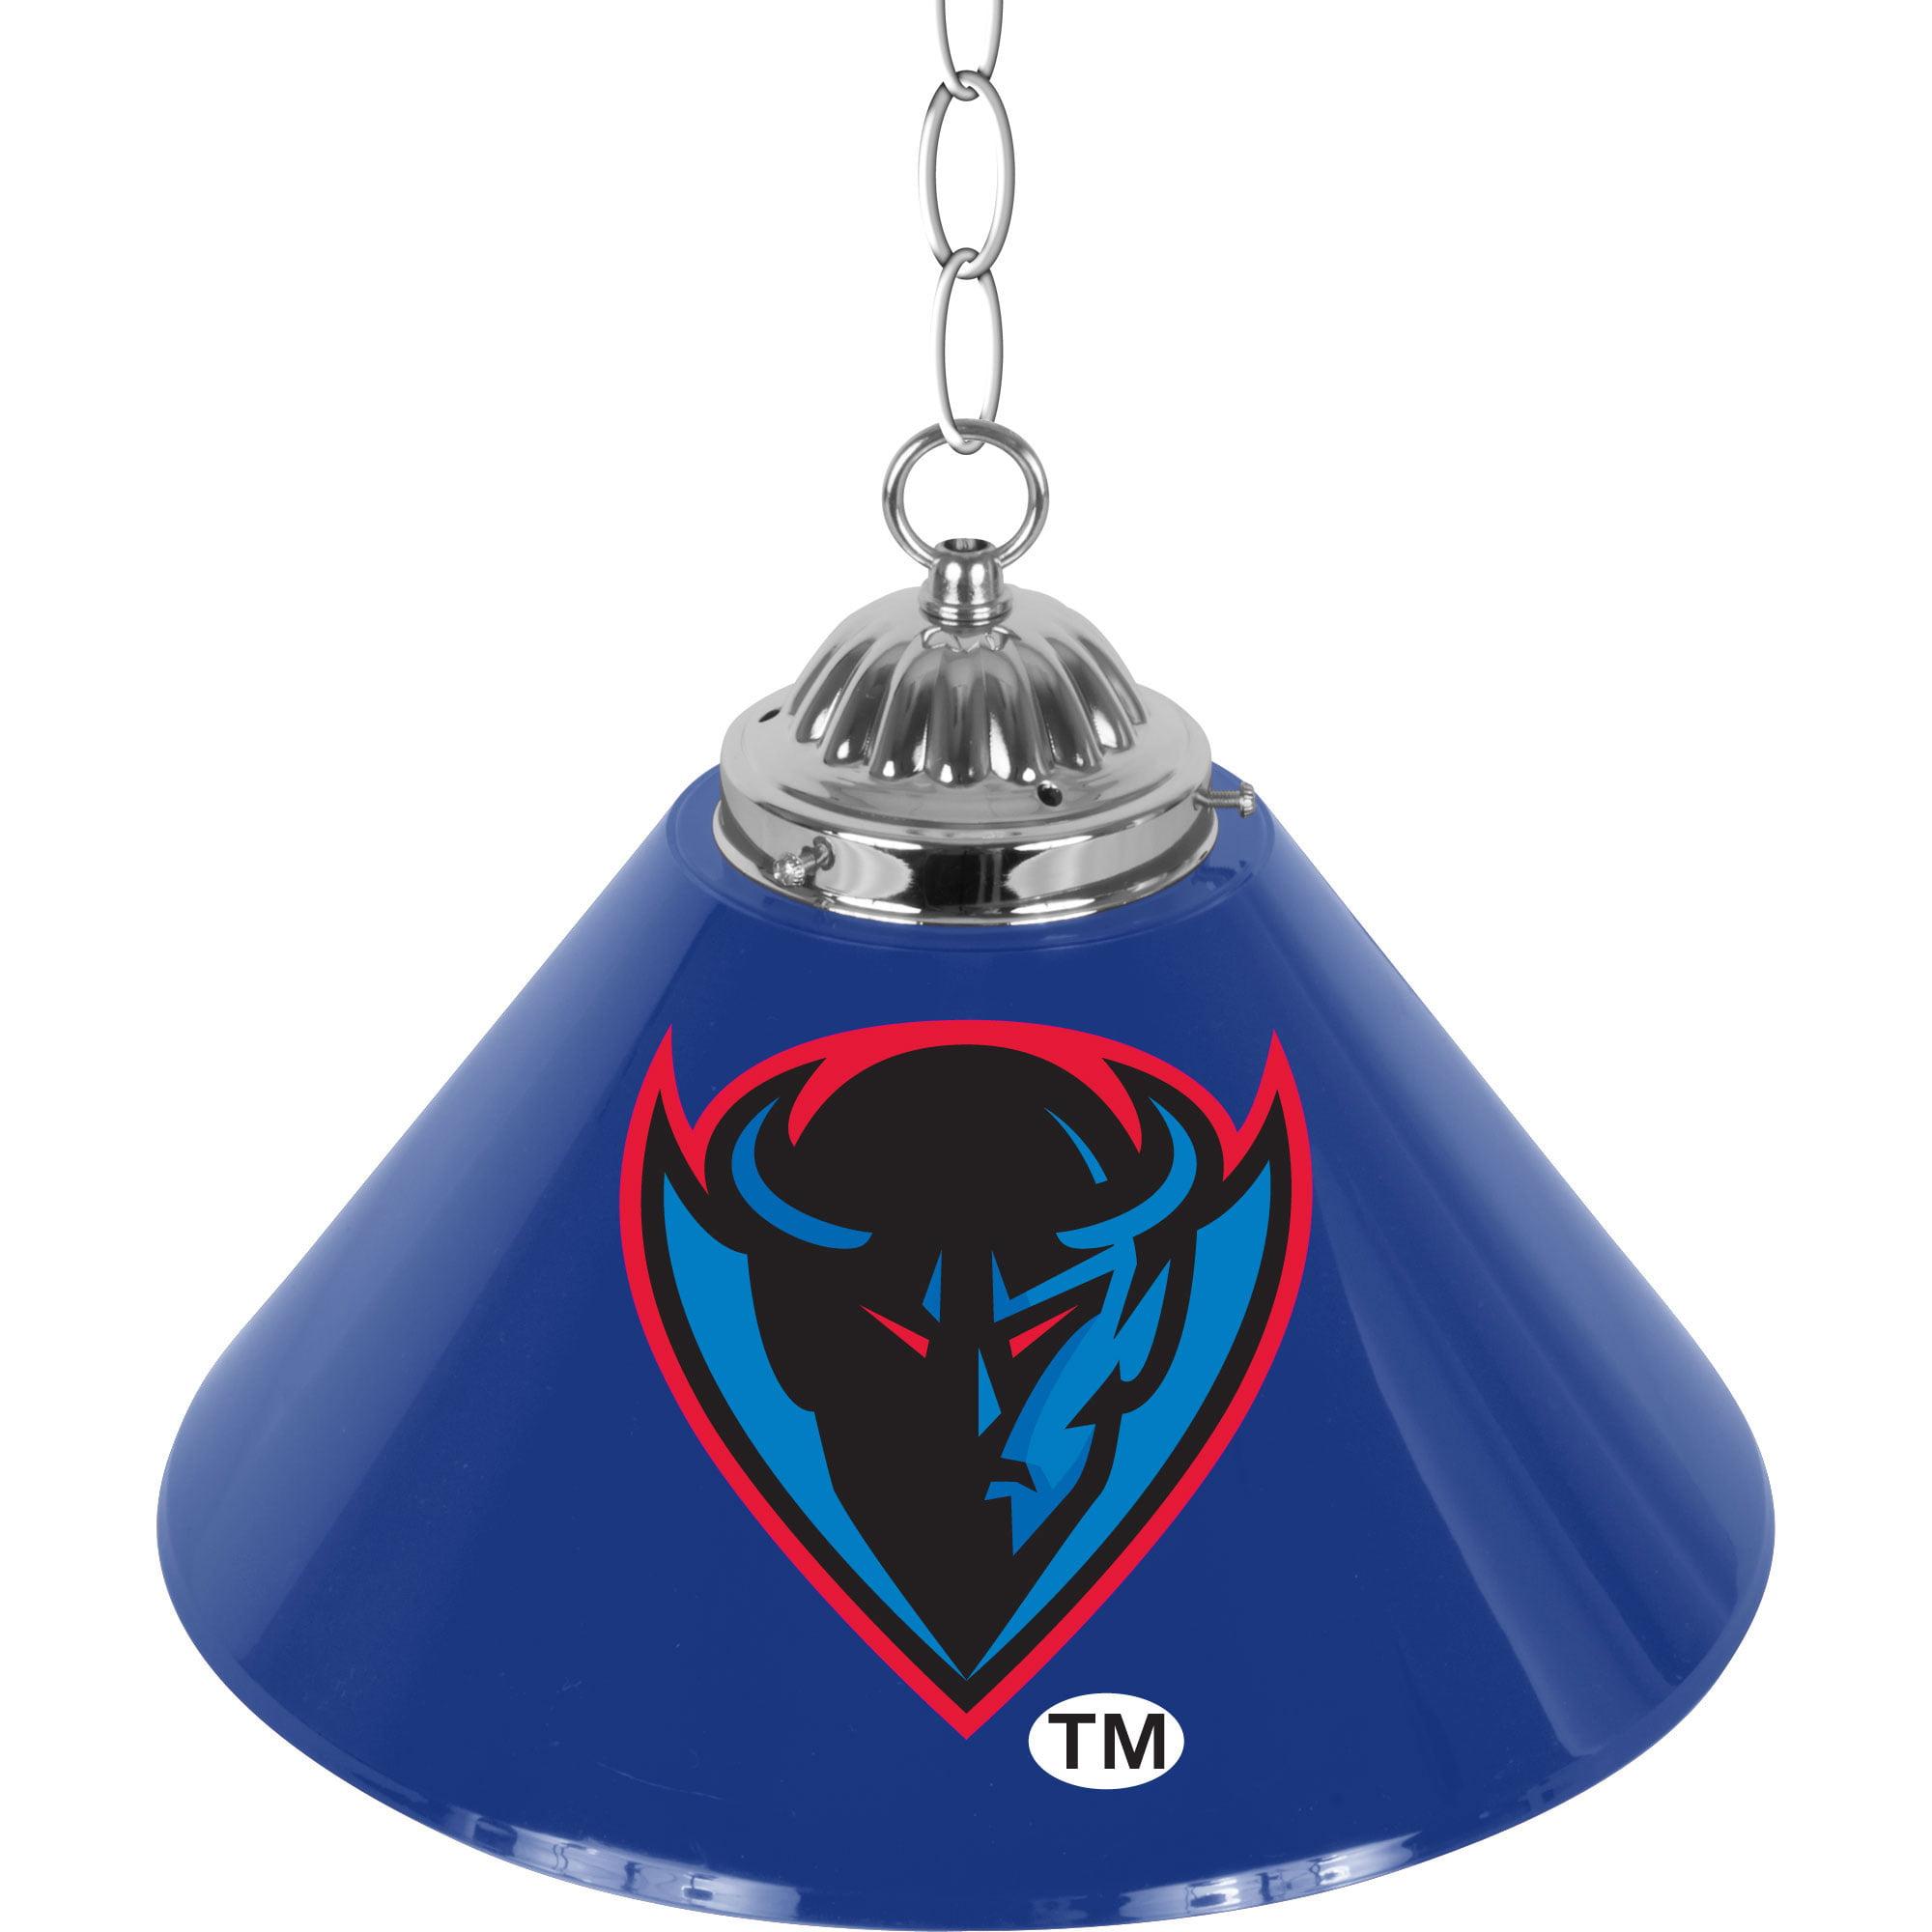 NCAA DePaul University Single Shade Bar Lamp - 14 inch